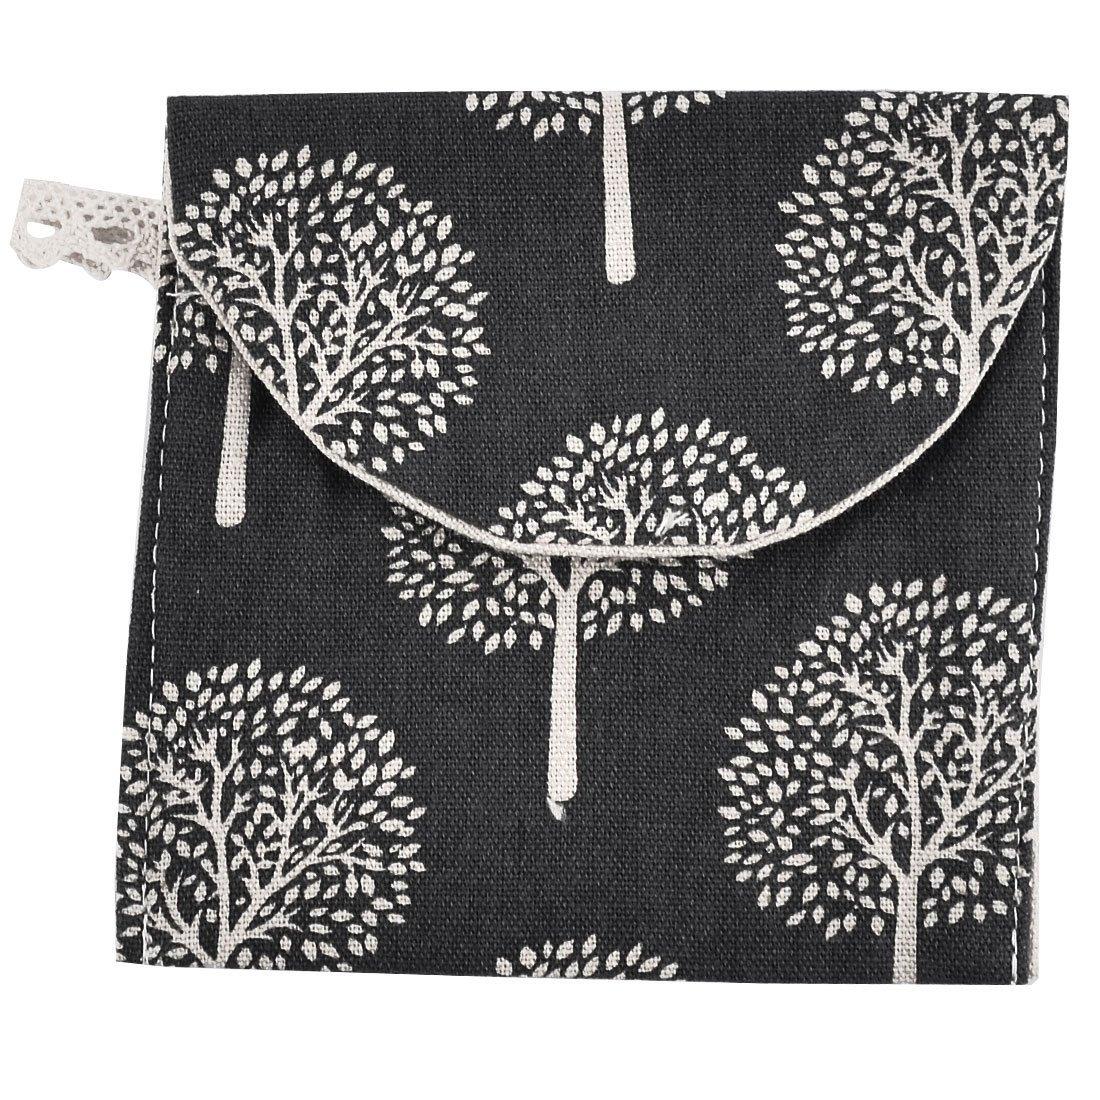 sourcingmap® leinen Quadrat Baum Muster Sanitäre Handtuch Servietten Pad Tasche Halter a16071800ux0002